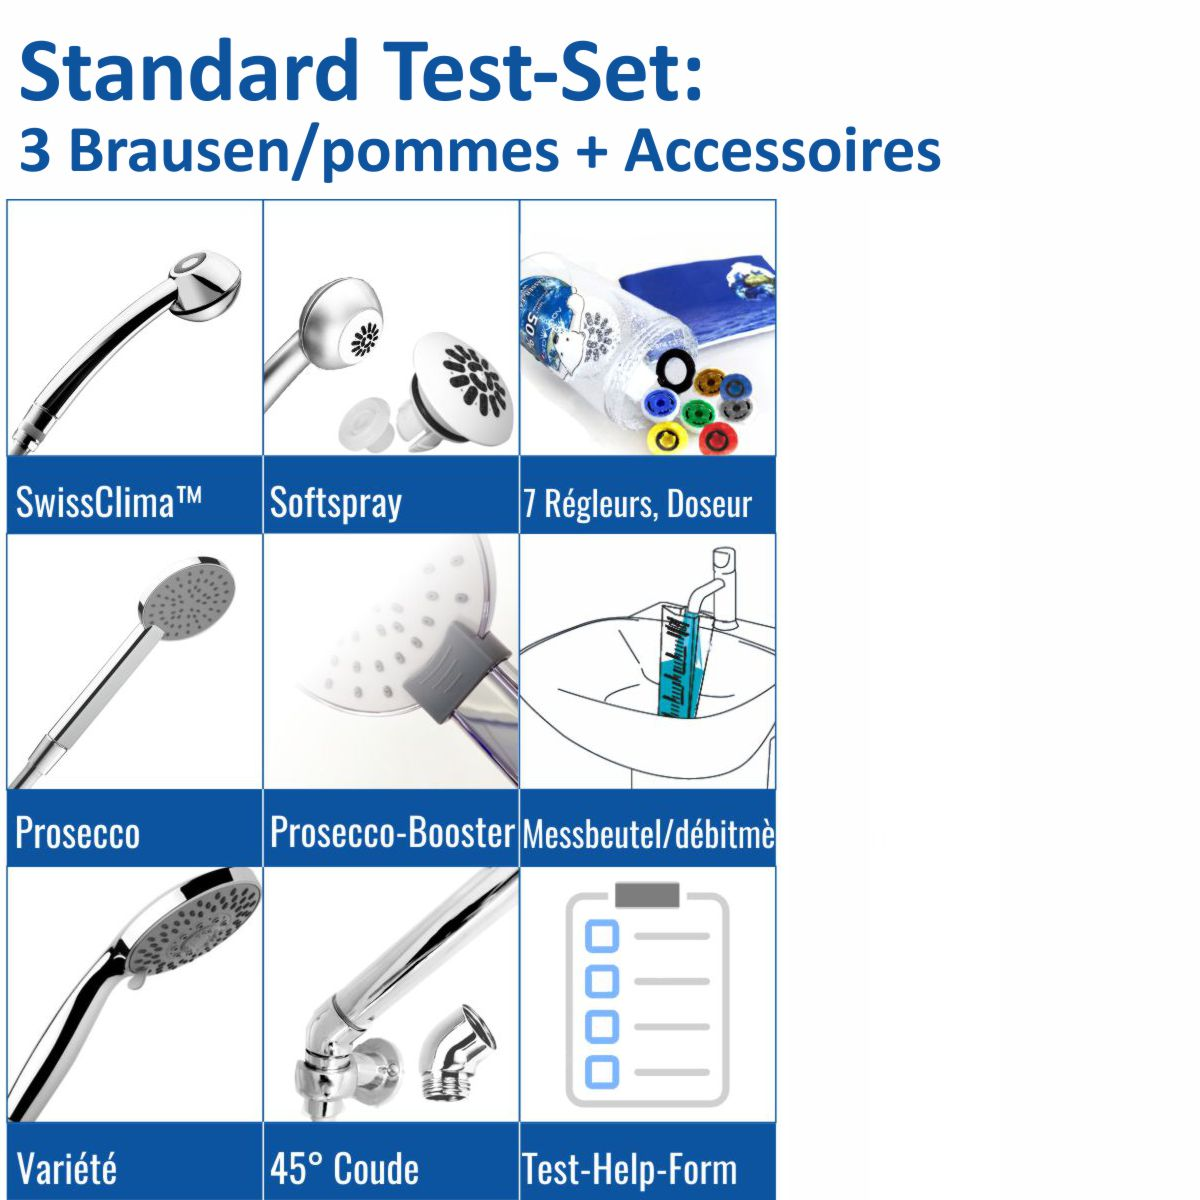 Standard-Test-Set